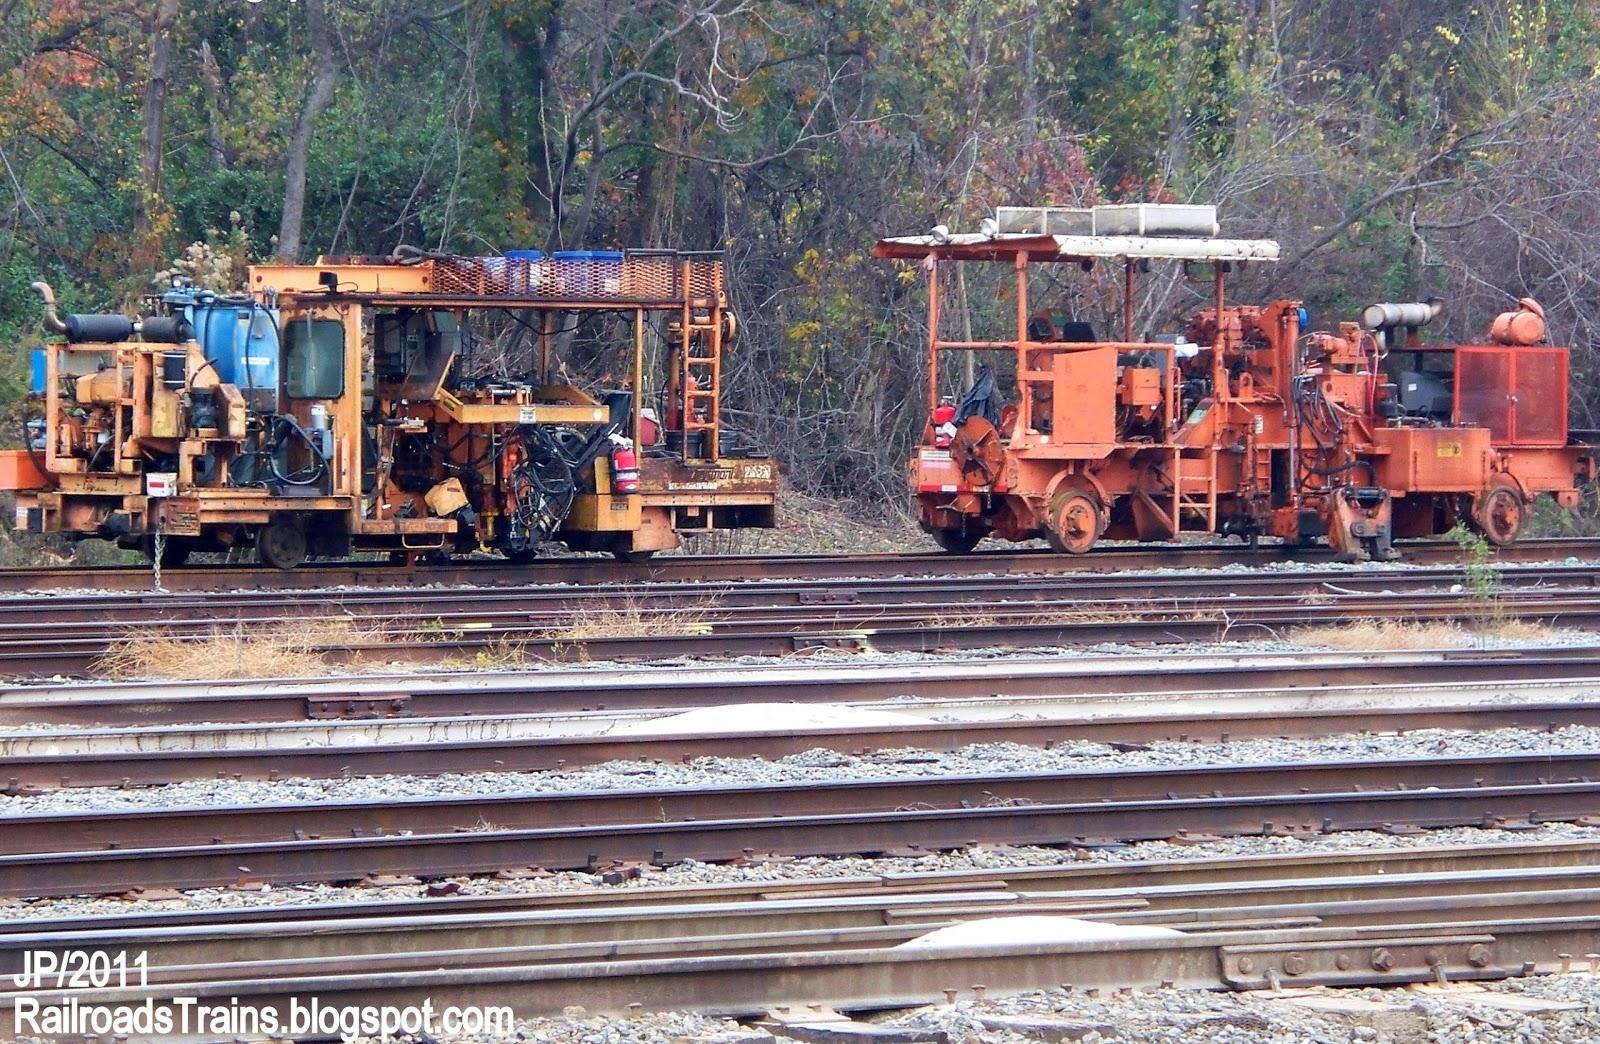 Southern siding augusta ga - Norfolk Southern Railroad Macon Georgia Ns Mw Track Cars On Siding Misc Railway Train Equipment Norfolk Southern Railroad Ns Track Maintenance Equipment